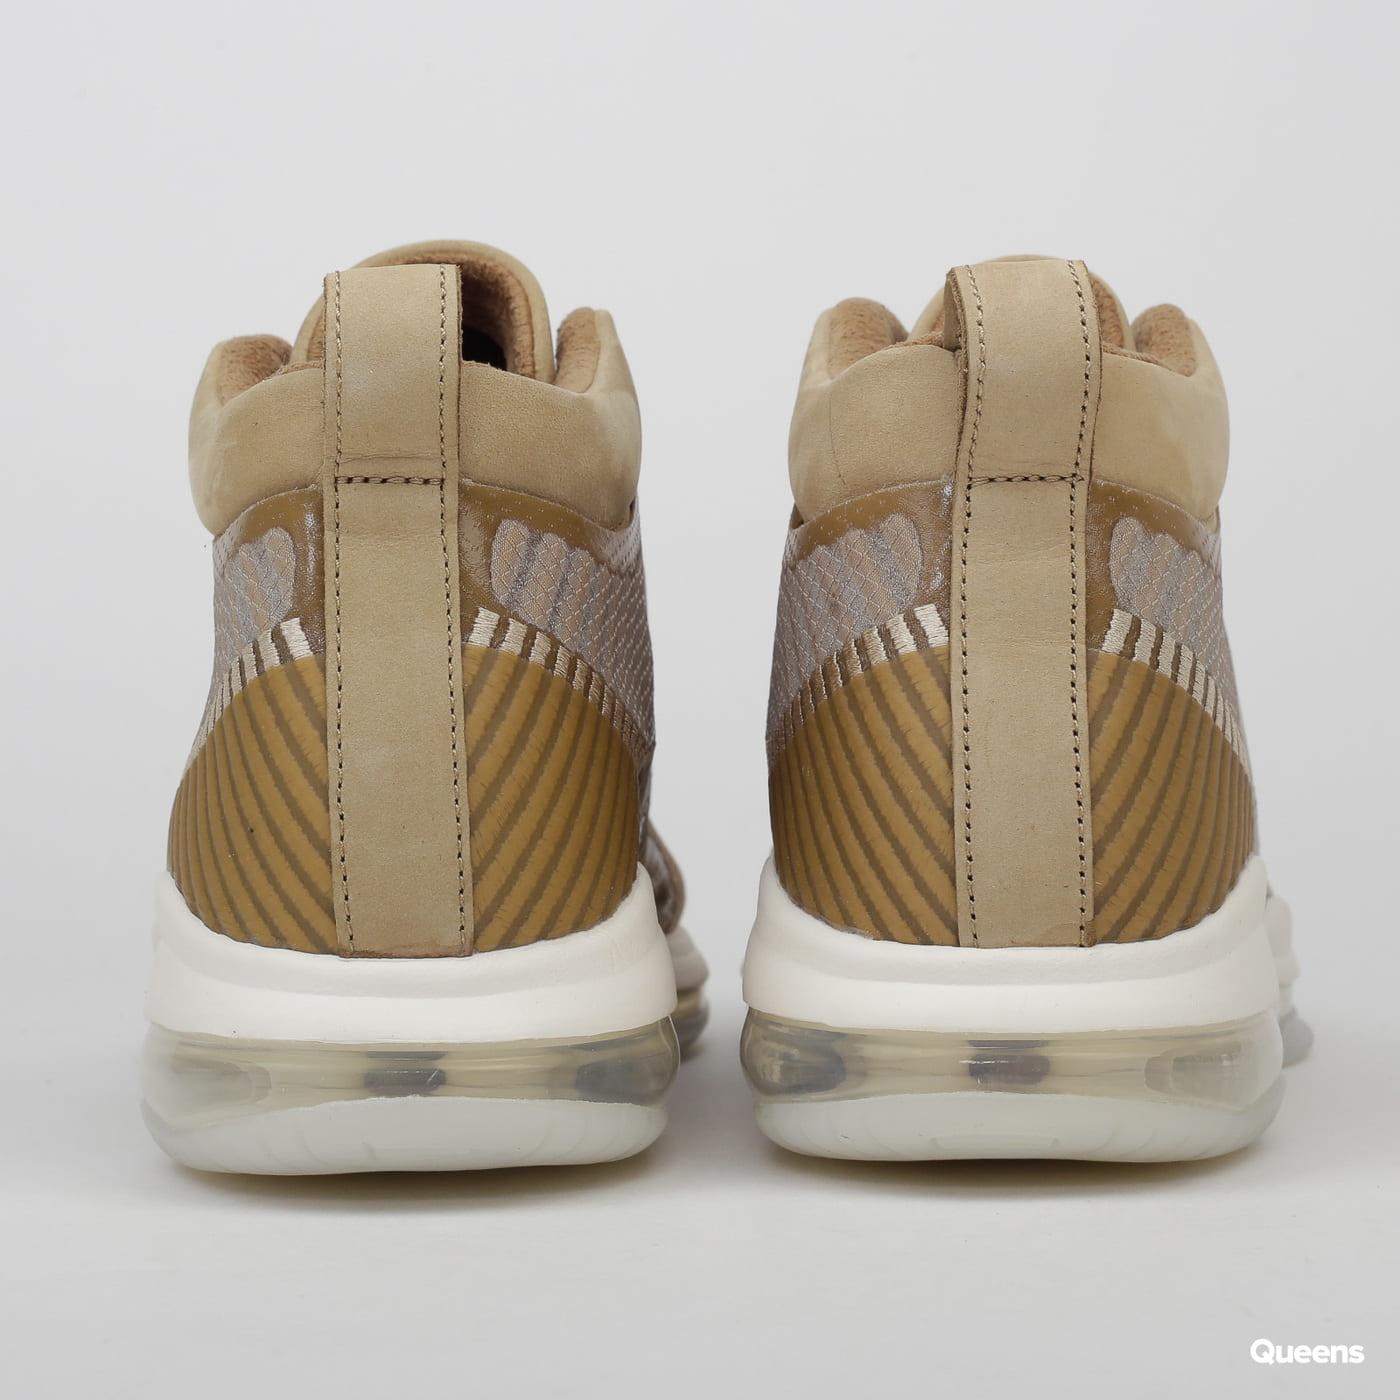 Nike Lebron X Je Icon QS parachute beige / desert one